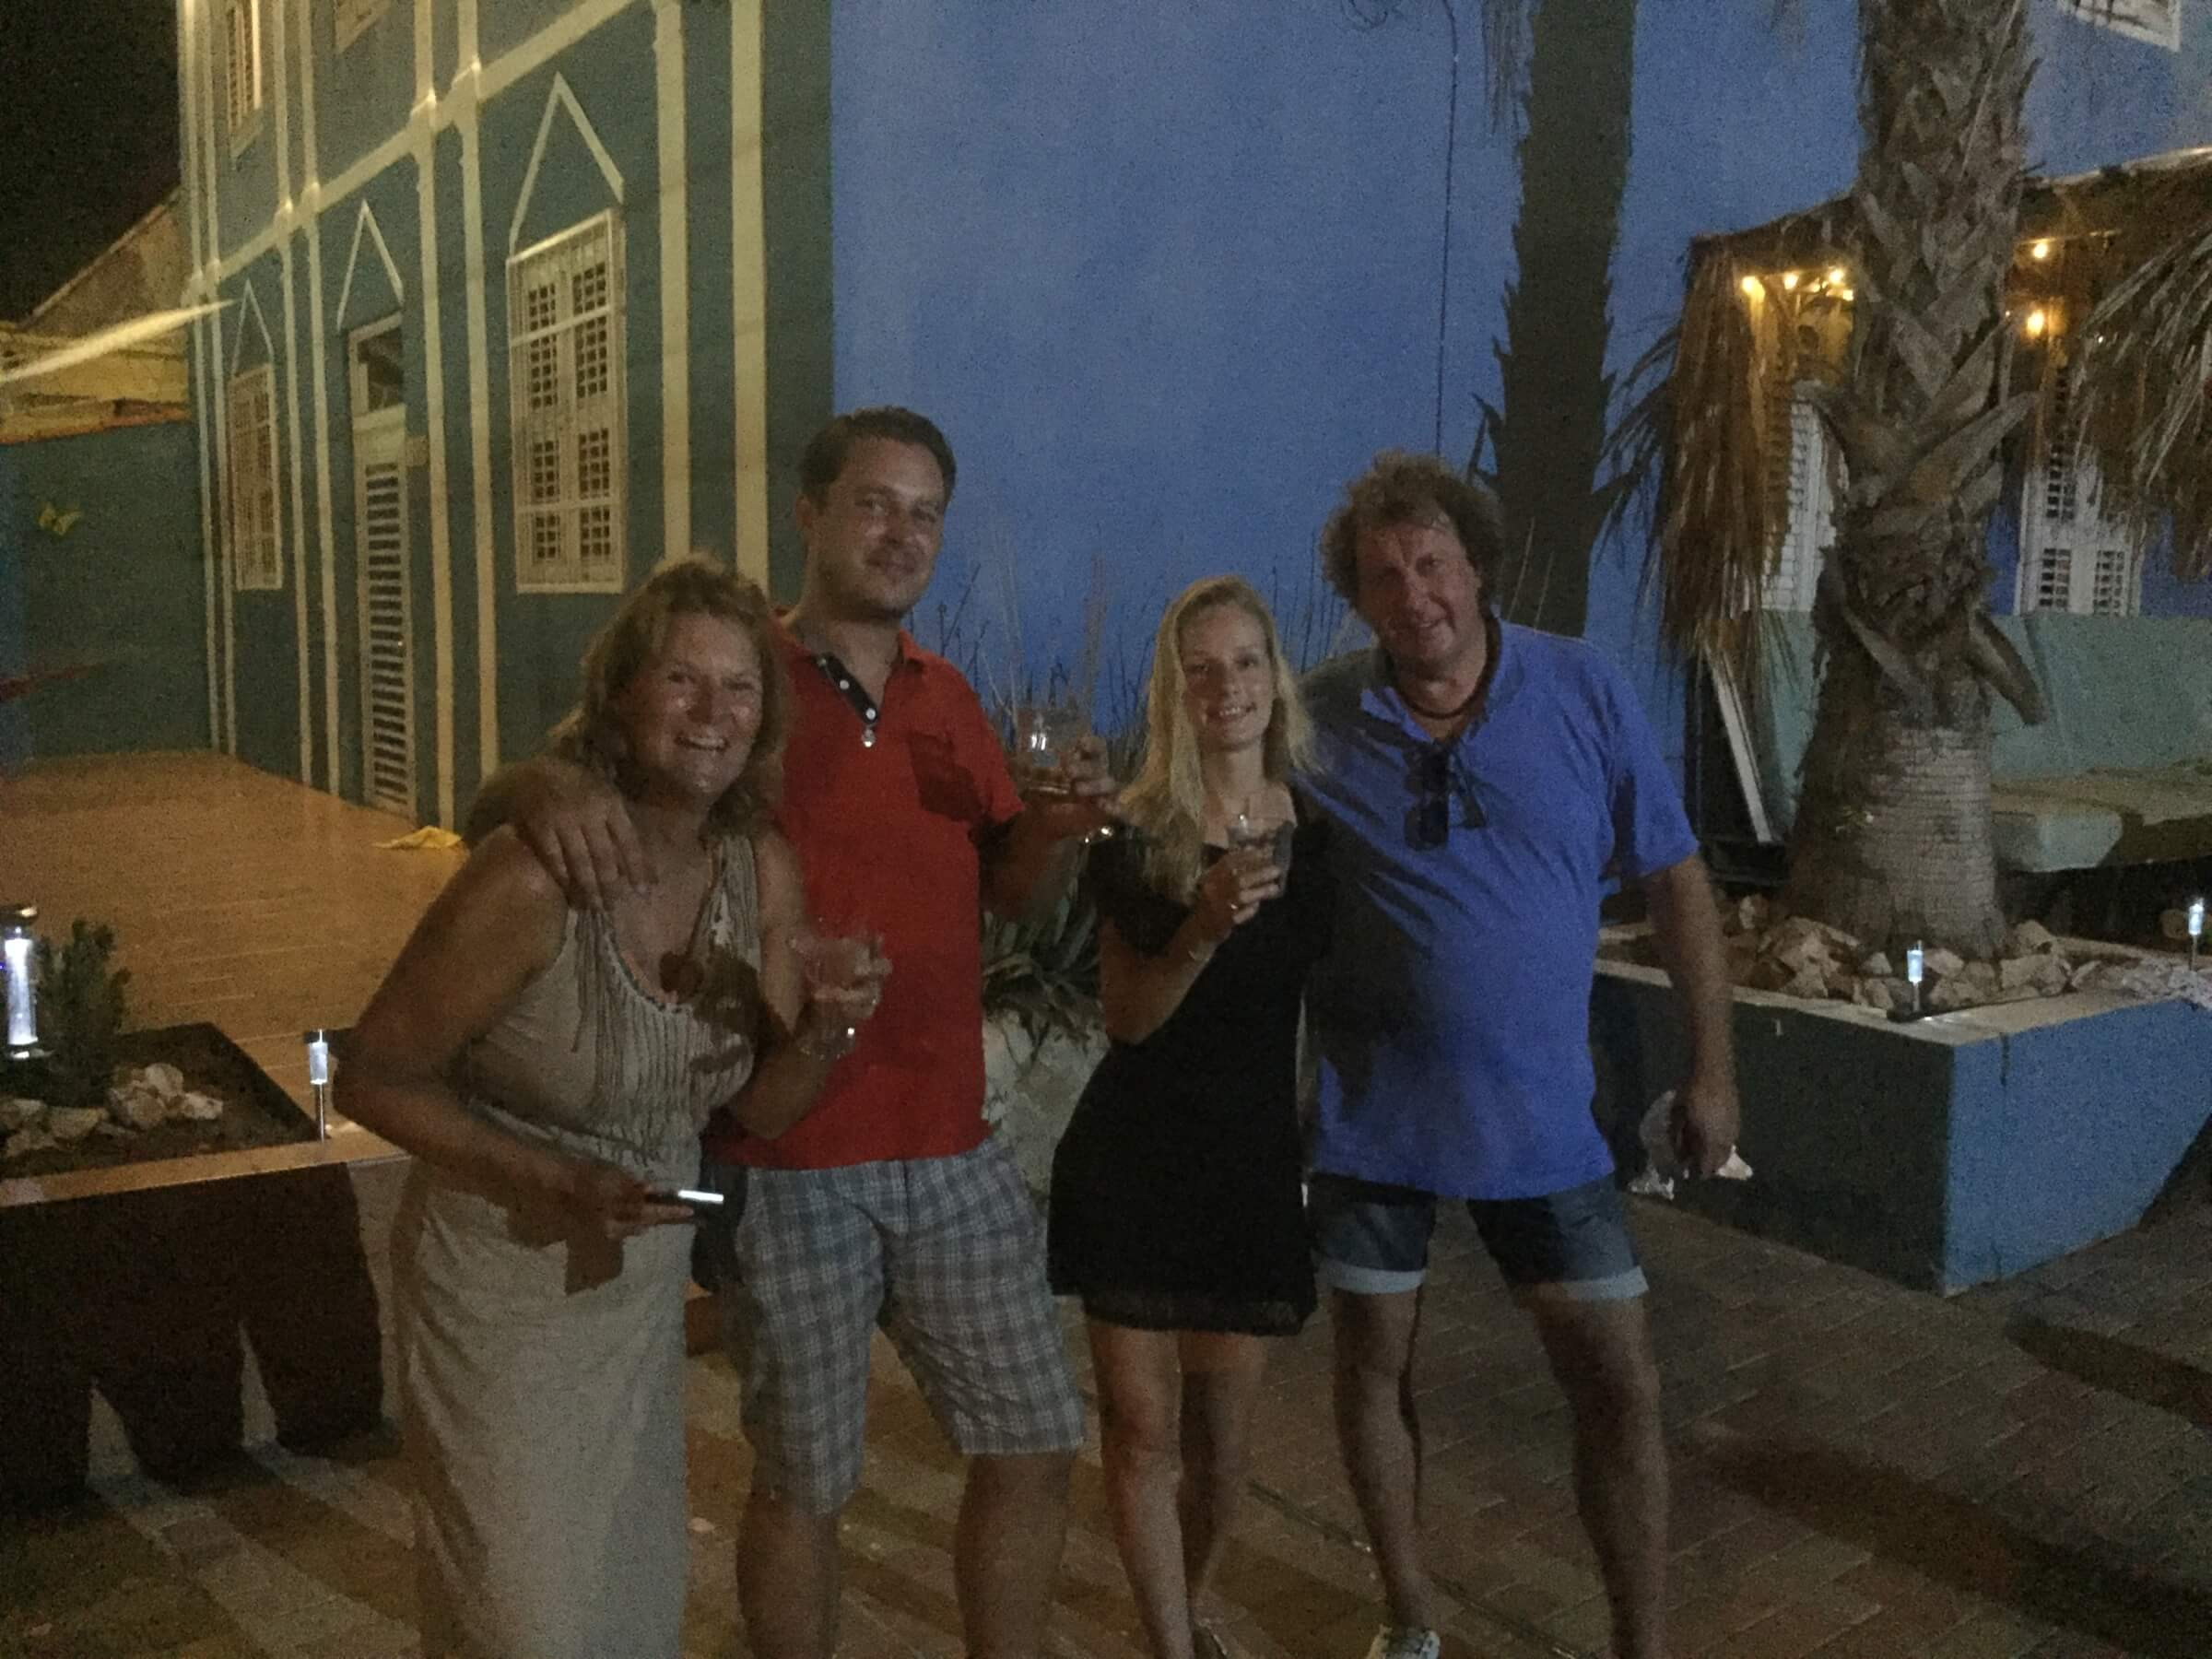 Beheerder Kamerverhuur op Curacao